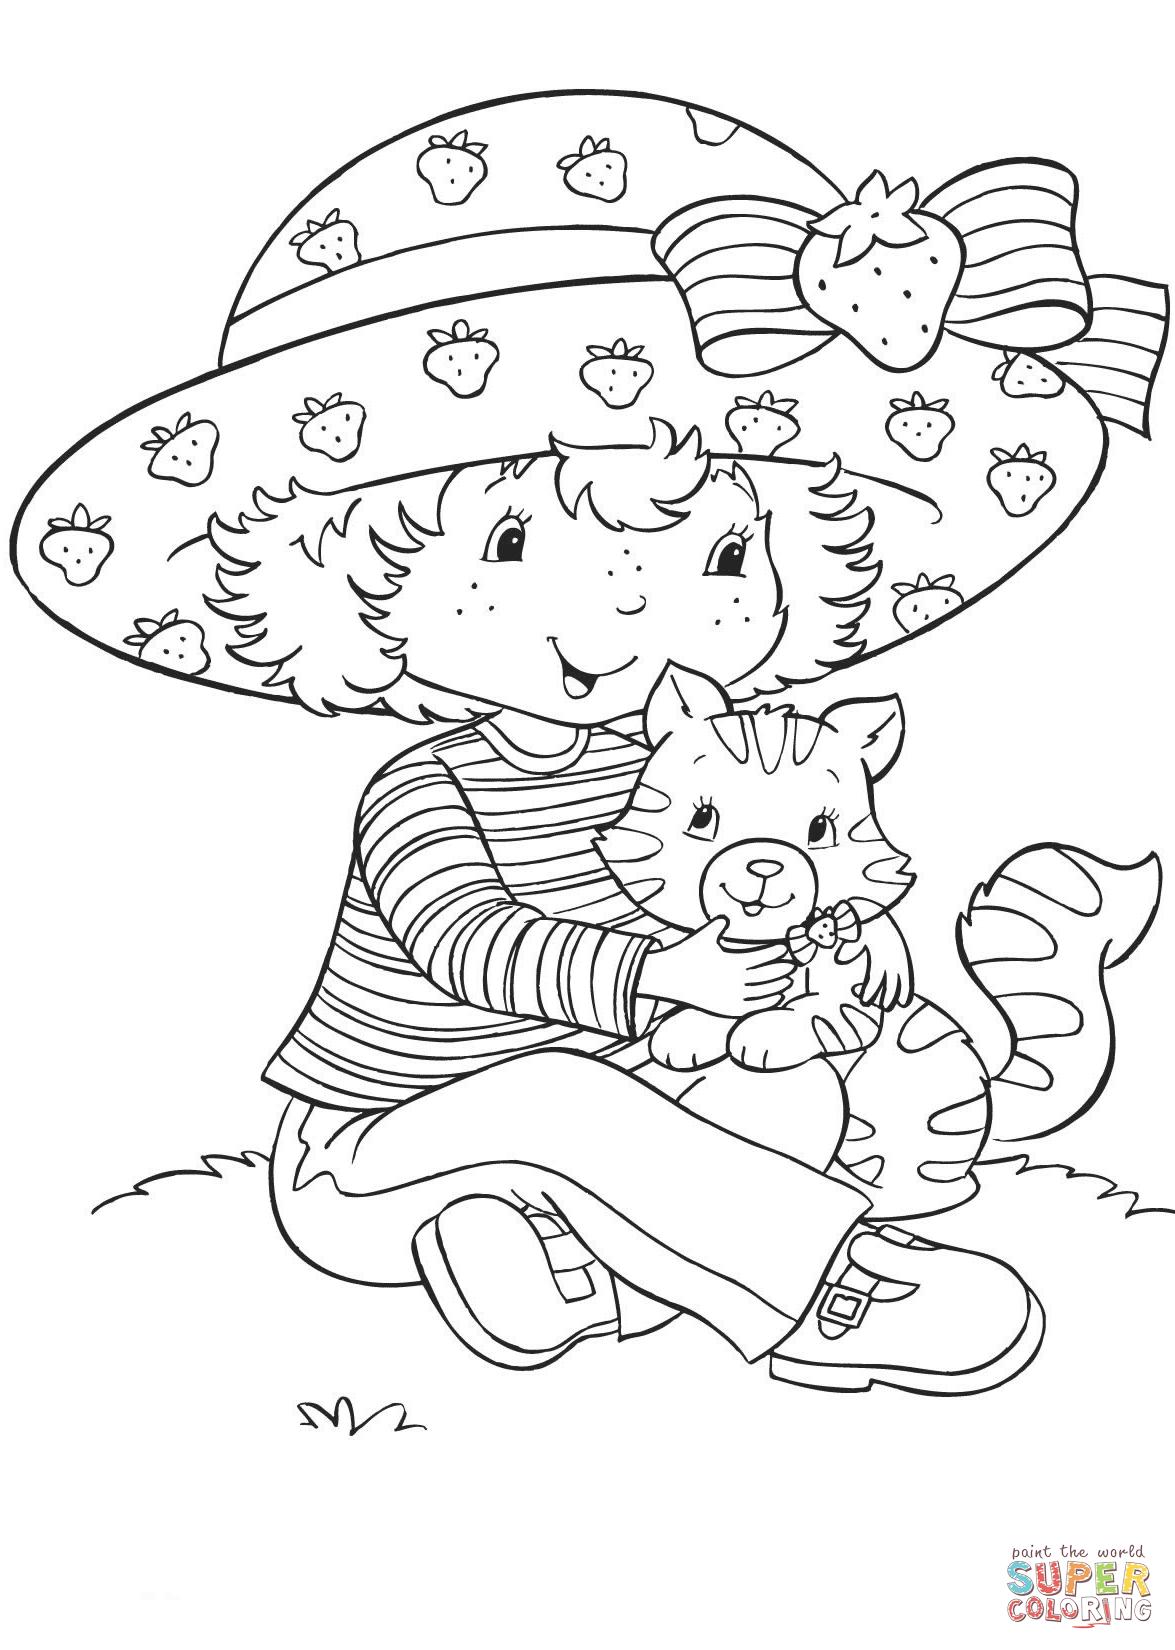 Strawberry Shortcake With Custard Super Coloring In 2020 Strawberry Shortcake Coloring Pages Coloring Pages Coloring Pages For Kids